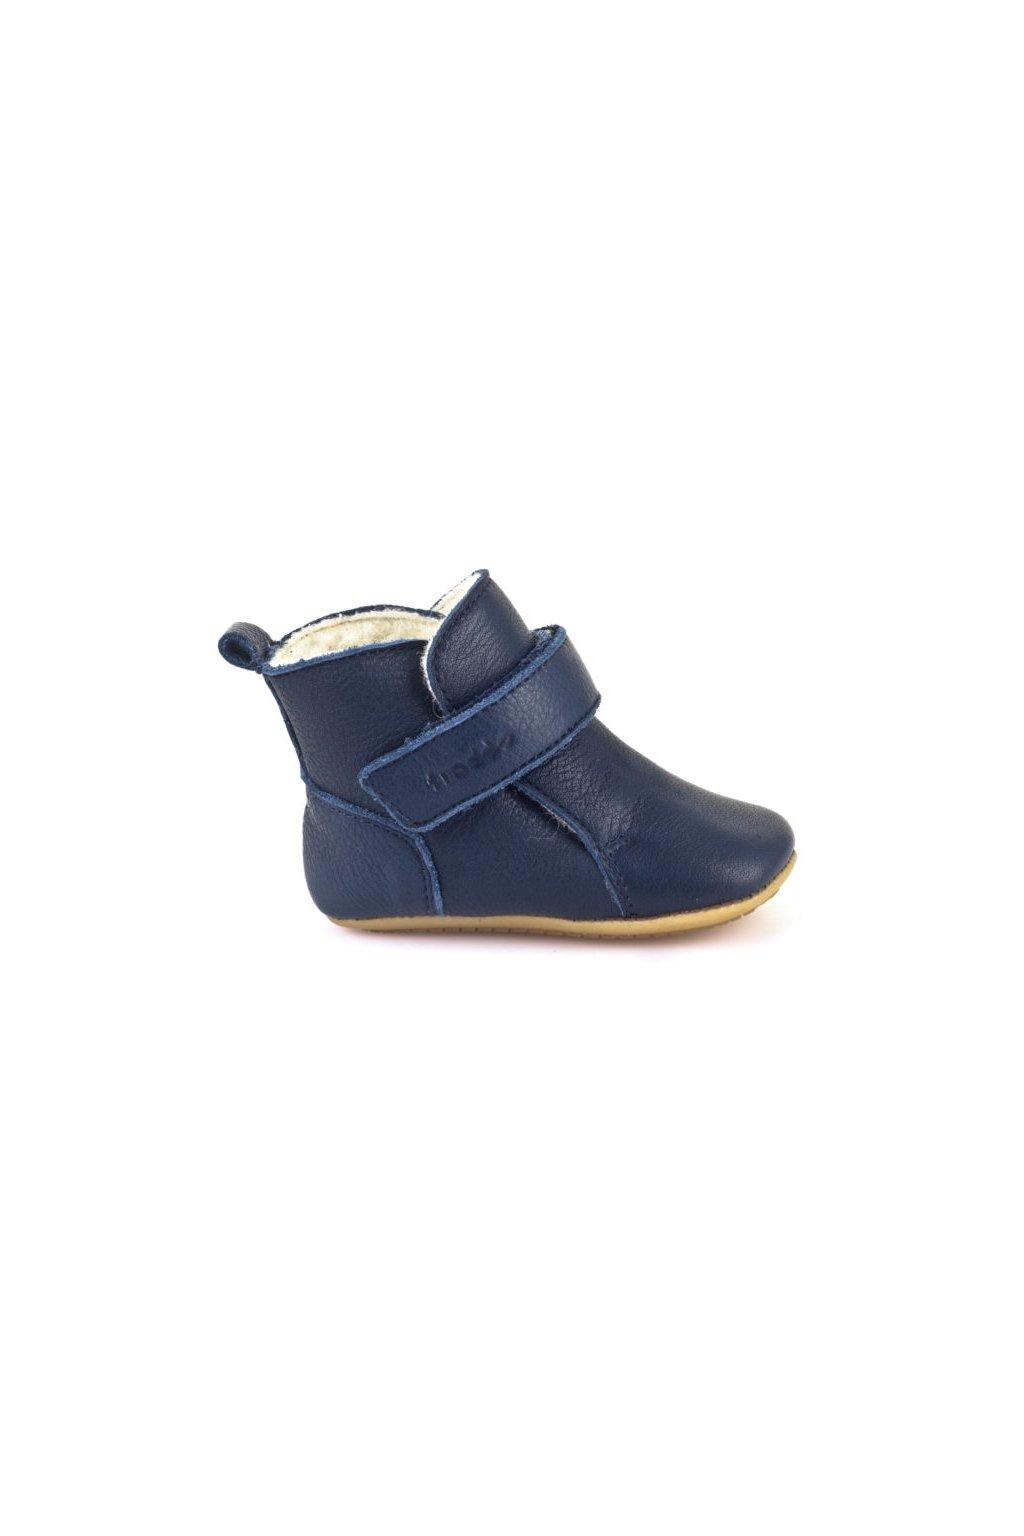 Froddo Prewalkers BOOTS Dark Blue